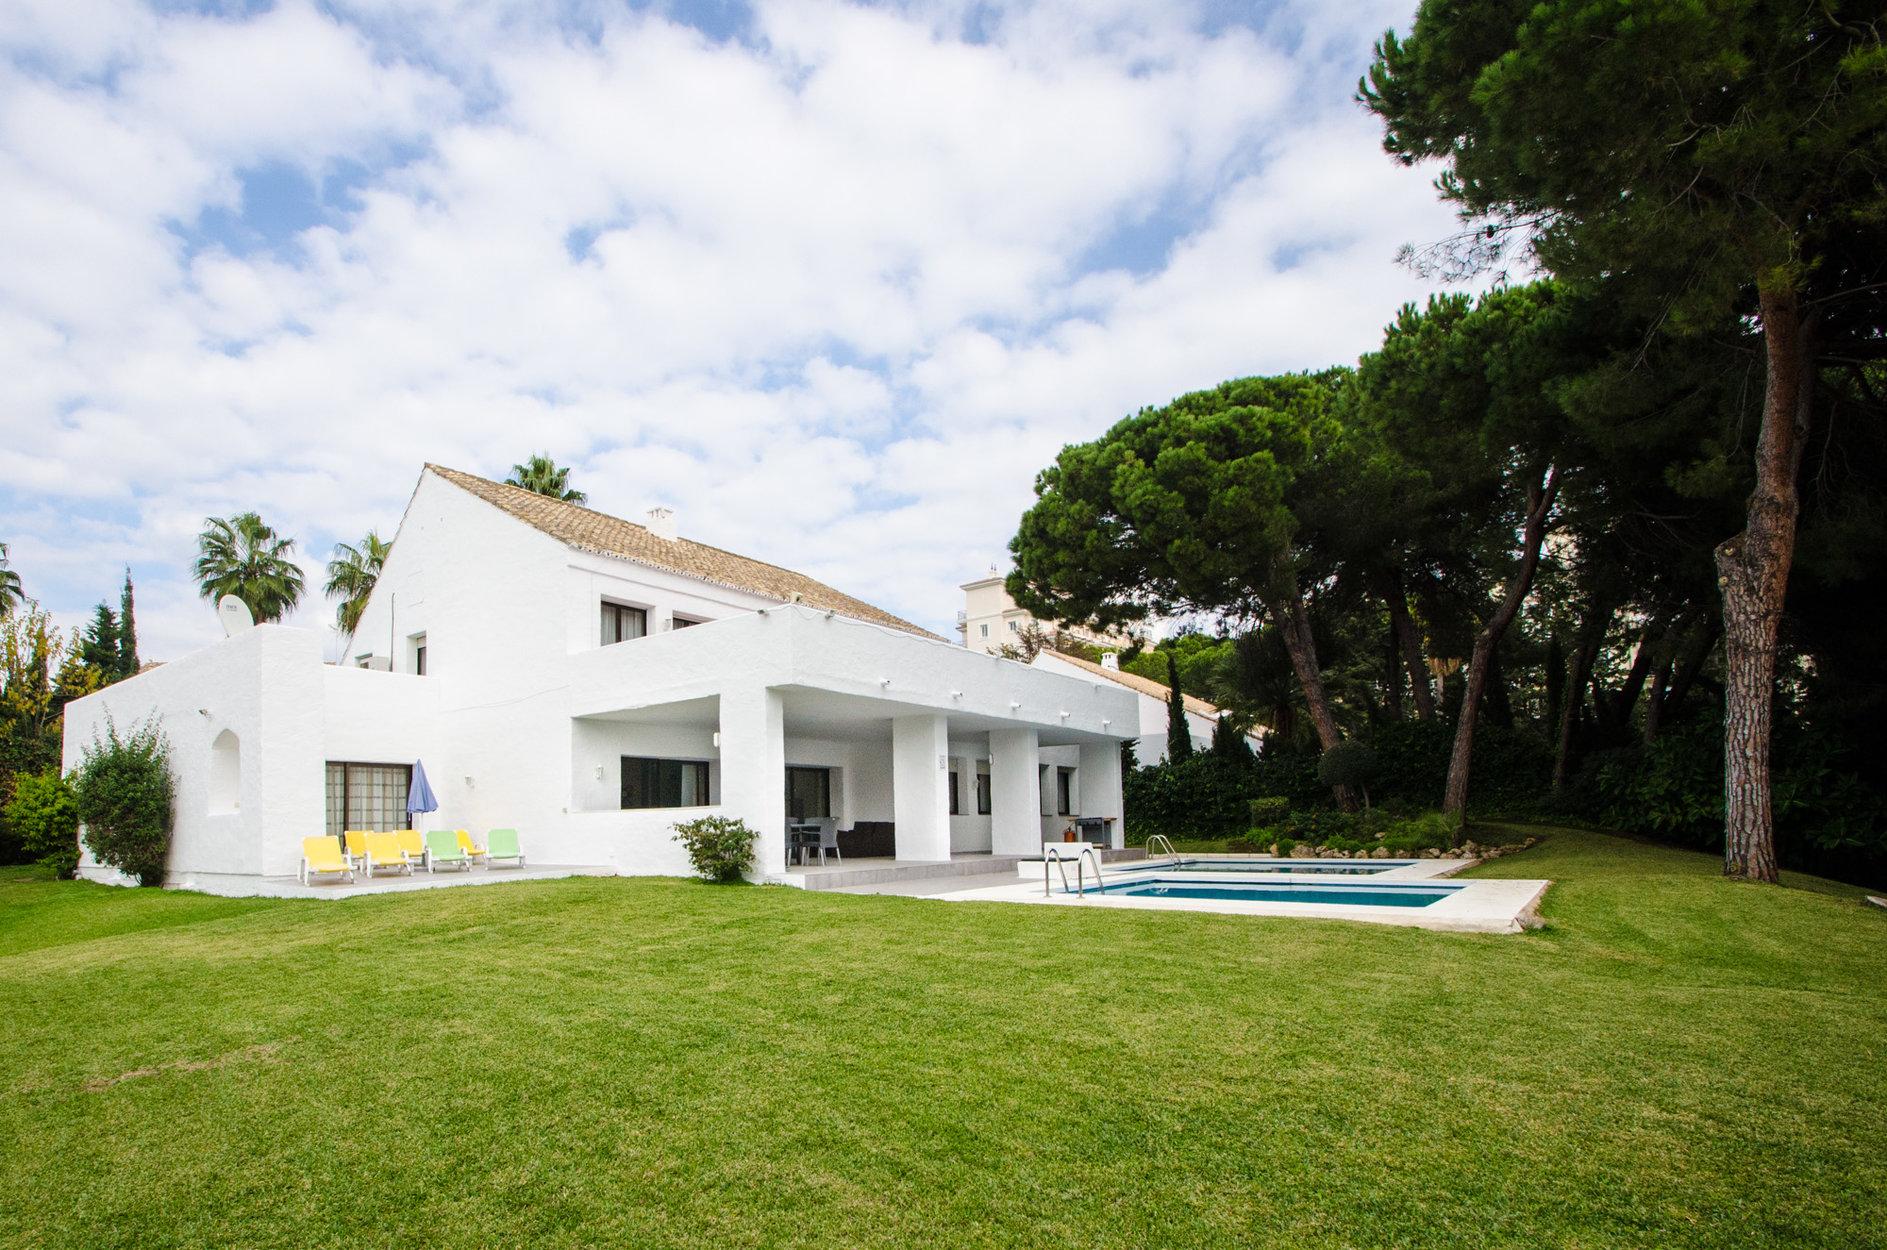 aaa5 Комнатный Дом в Puerto Banus, Marbella | M156597